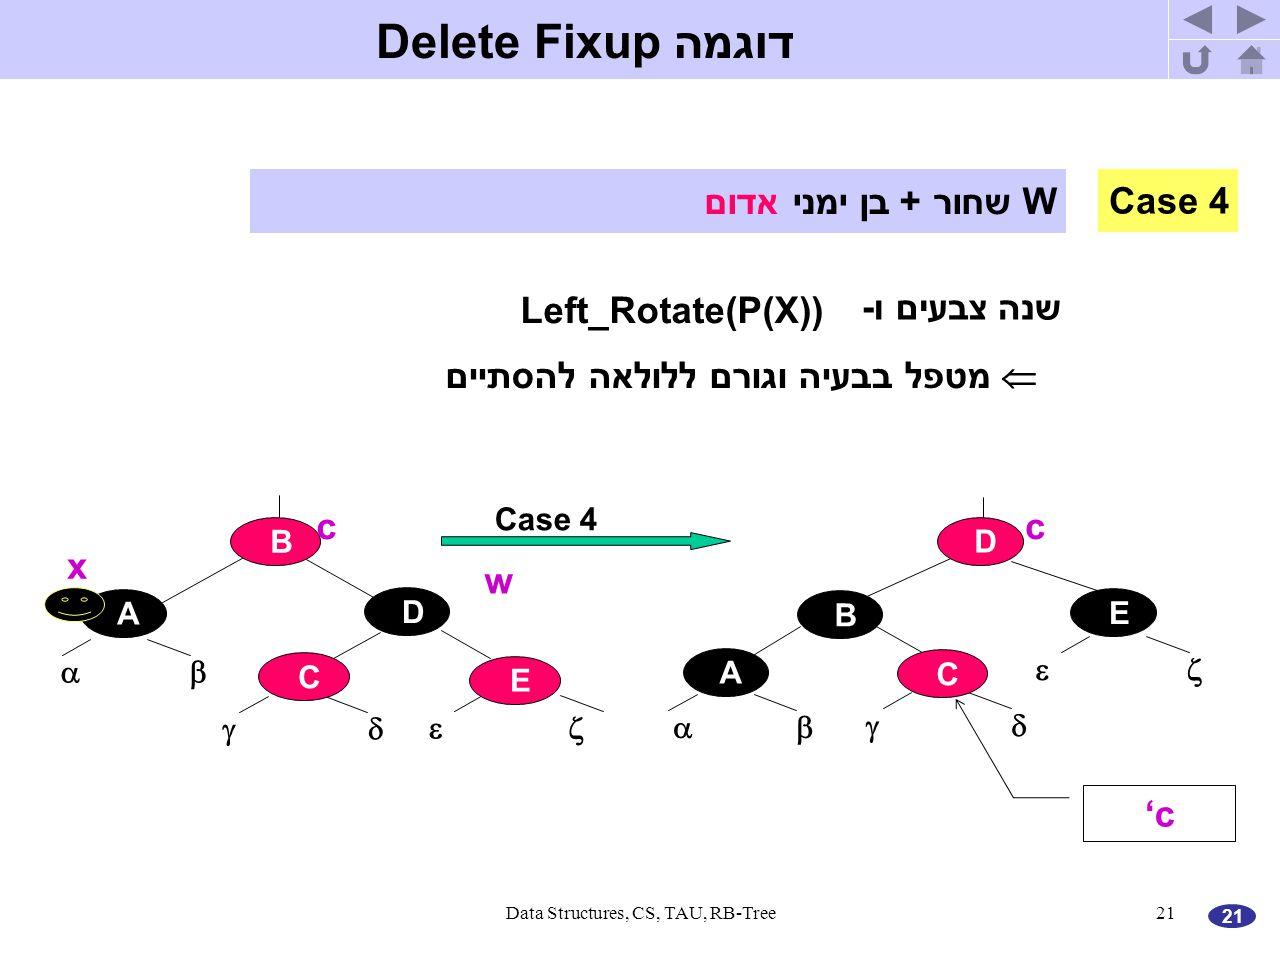 21 Data Structures, CS, TAU, RB-Tree21 דוגמה Delete Fixup A    B D Case 4 C E E    A D B C x w cc 'c Case 4 W שחור + בן ימני אדום שנה צבעים ו- Left_Rotate(P(X))  מטפל בבעיה וגורם ללולאה להסתיים